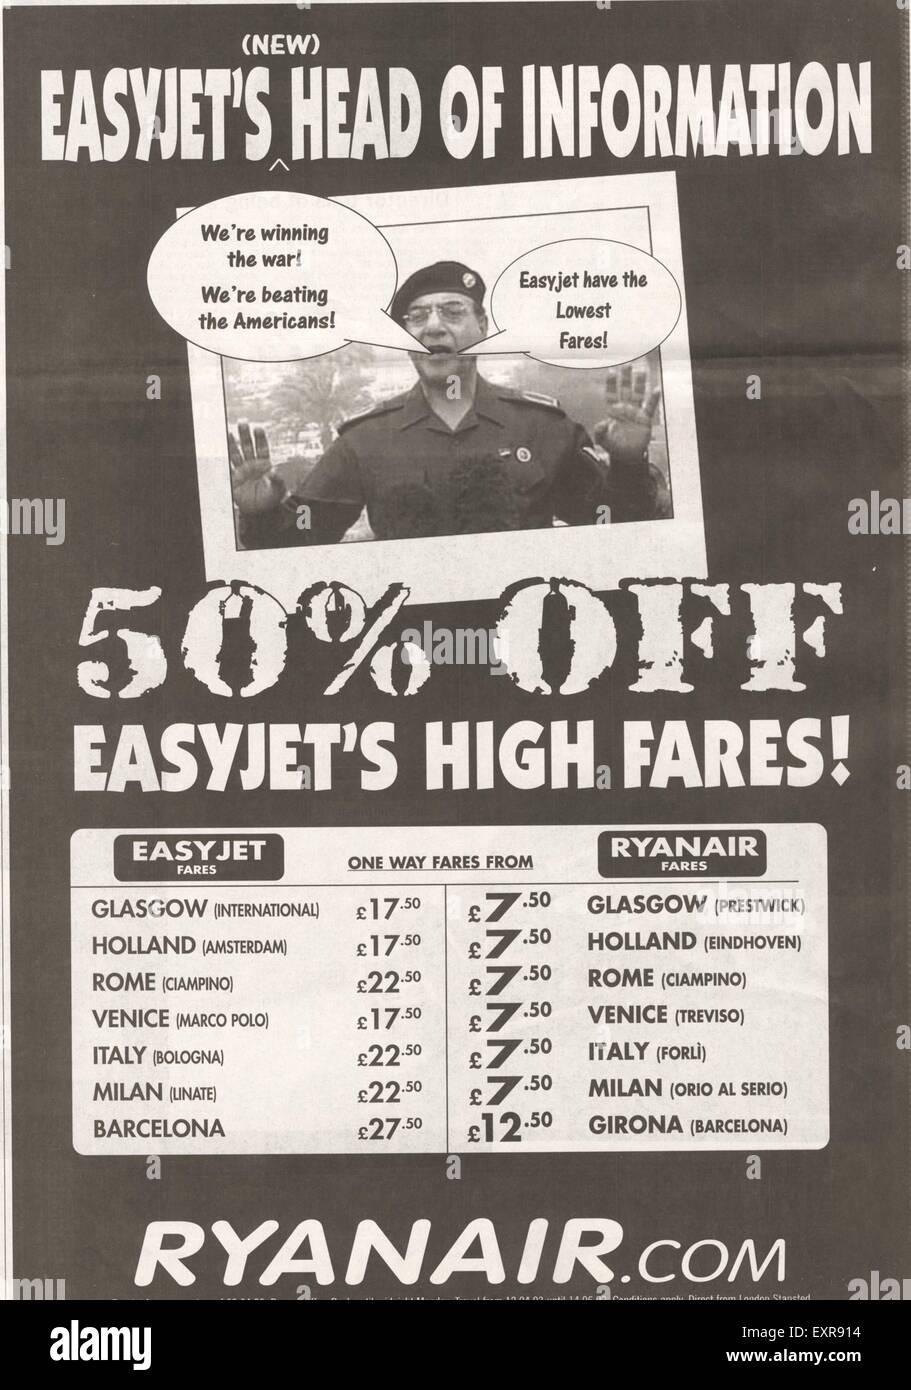 2000s UK Ryan Air  Ryanair Airlines Newspaper Advert - Stock Image